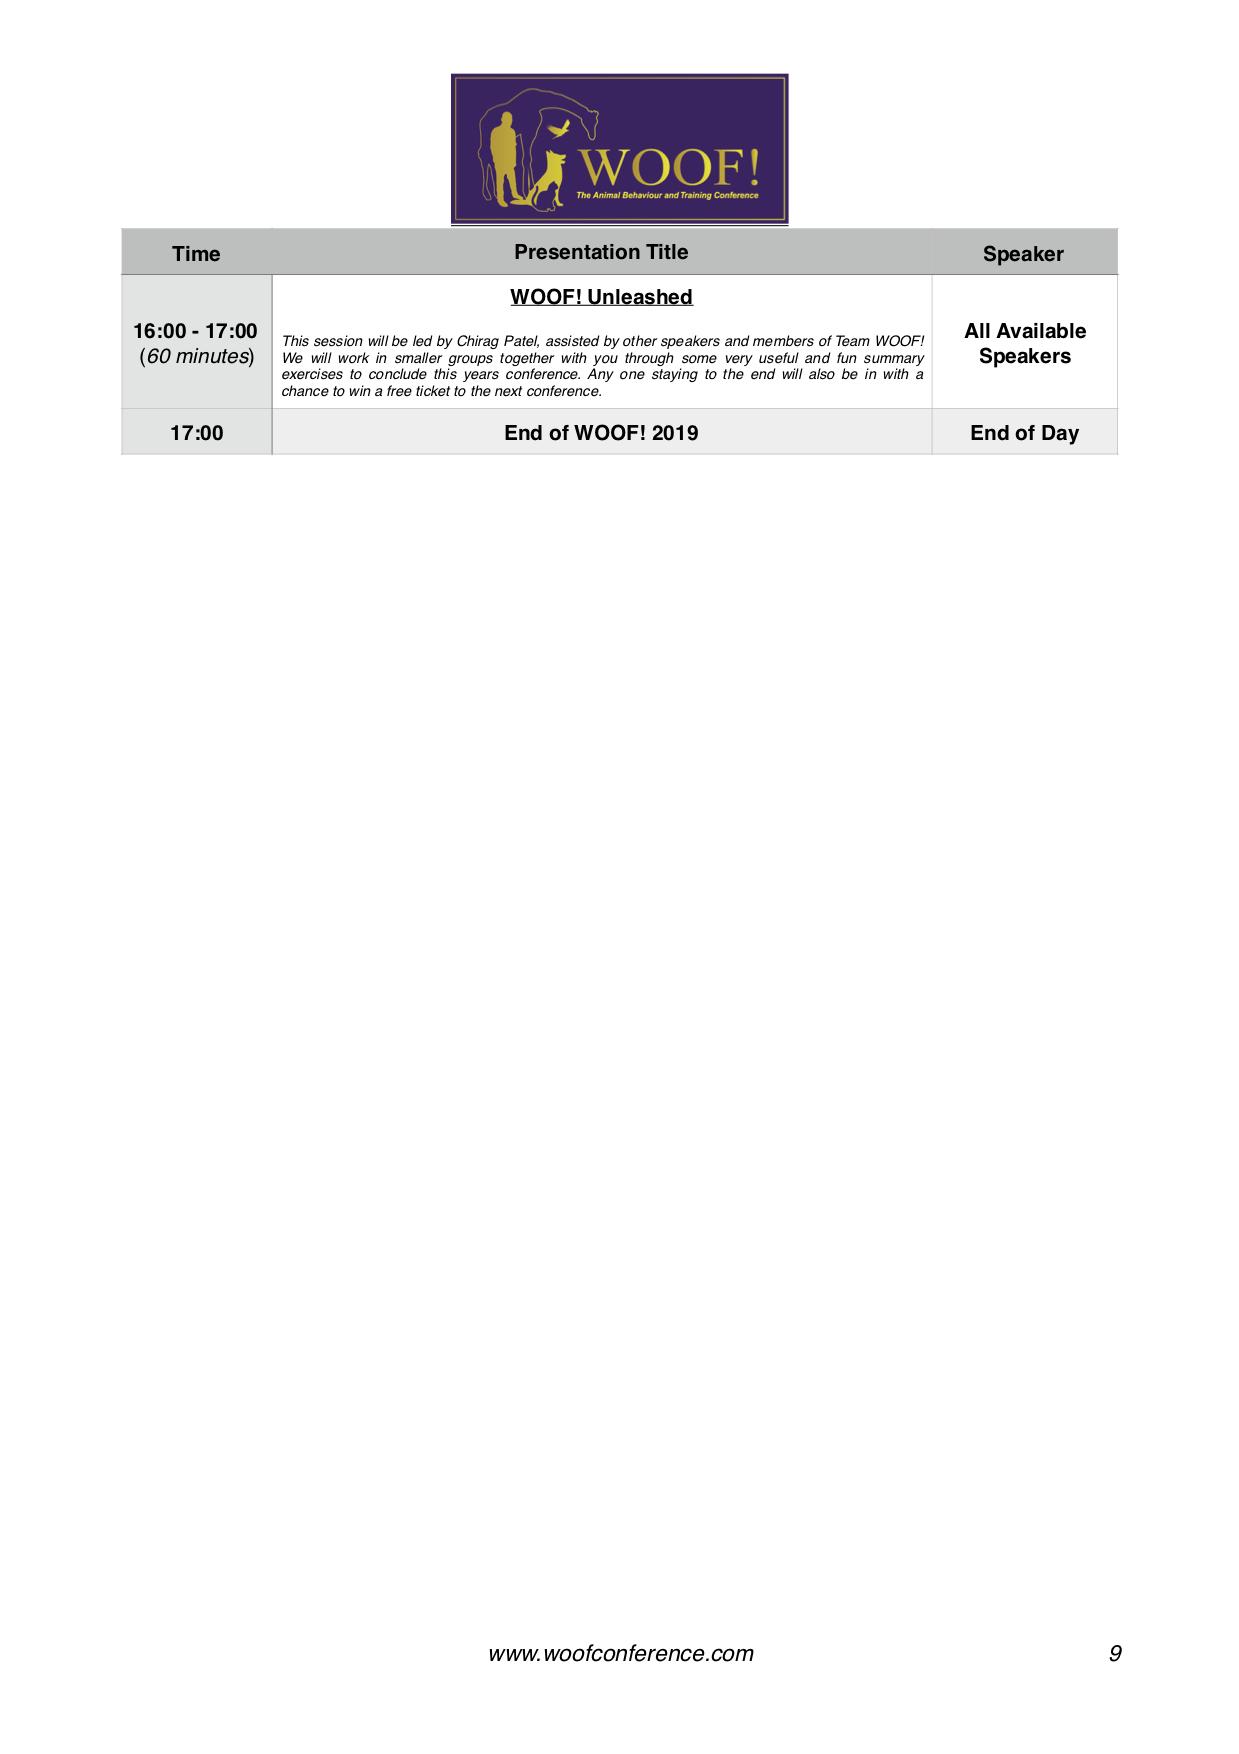 WOOF! 2019 Schedule Public 1.0 Page 9.jpg